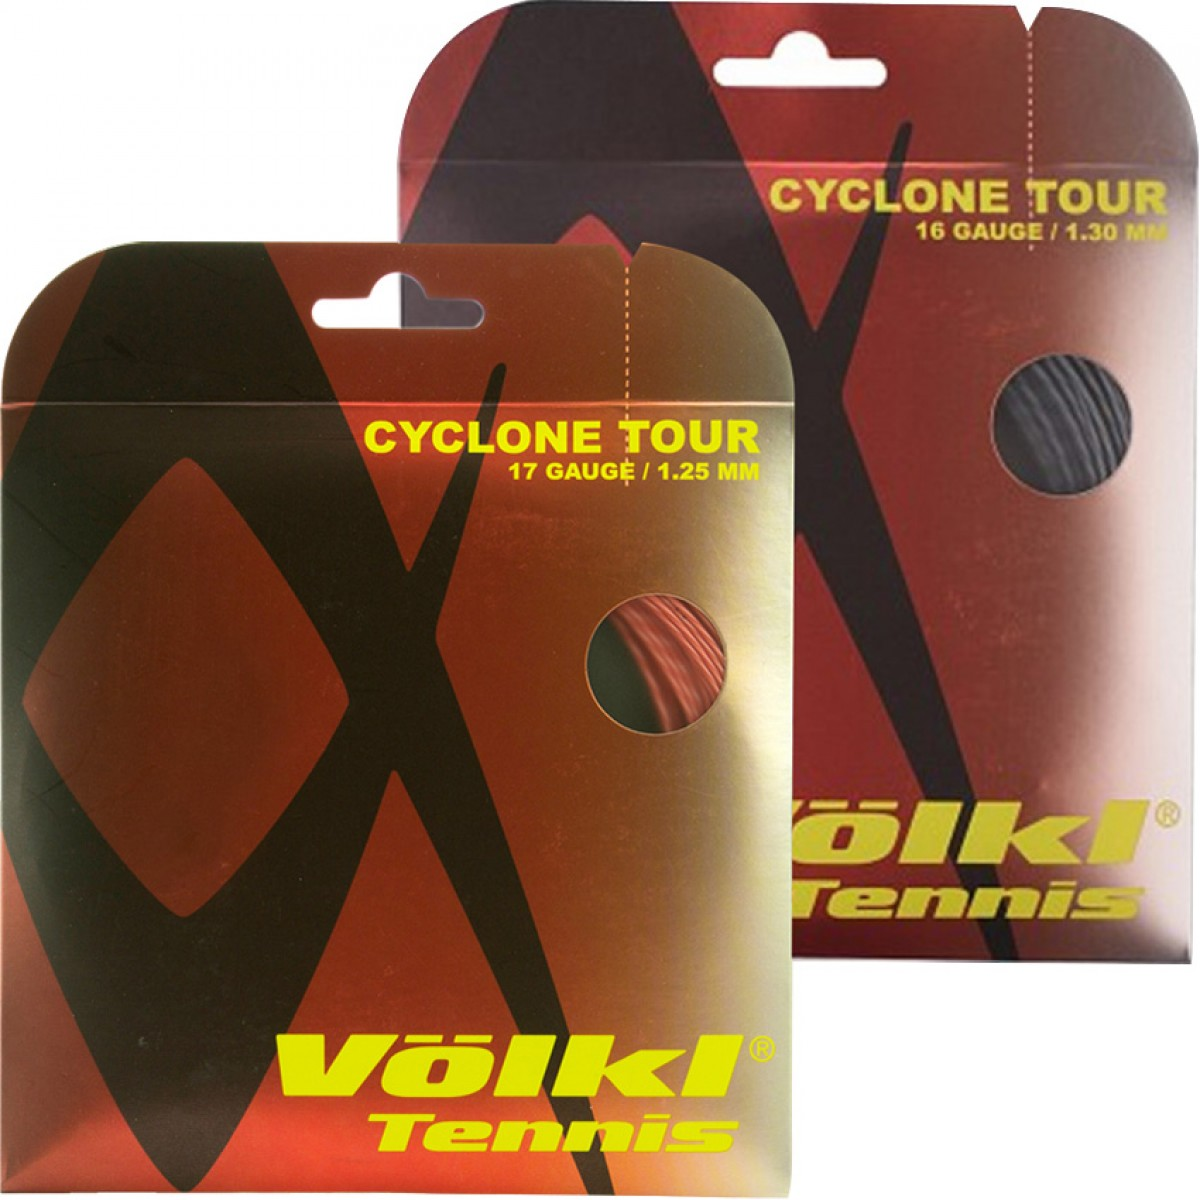 CORDAGE VOLKL CYCLONE TOUR (12 METRES)